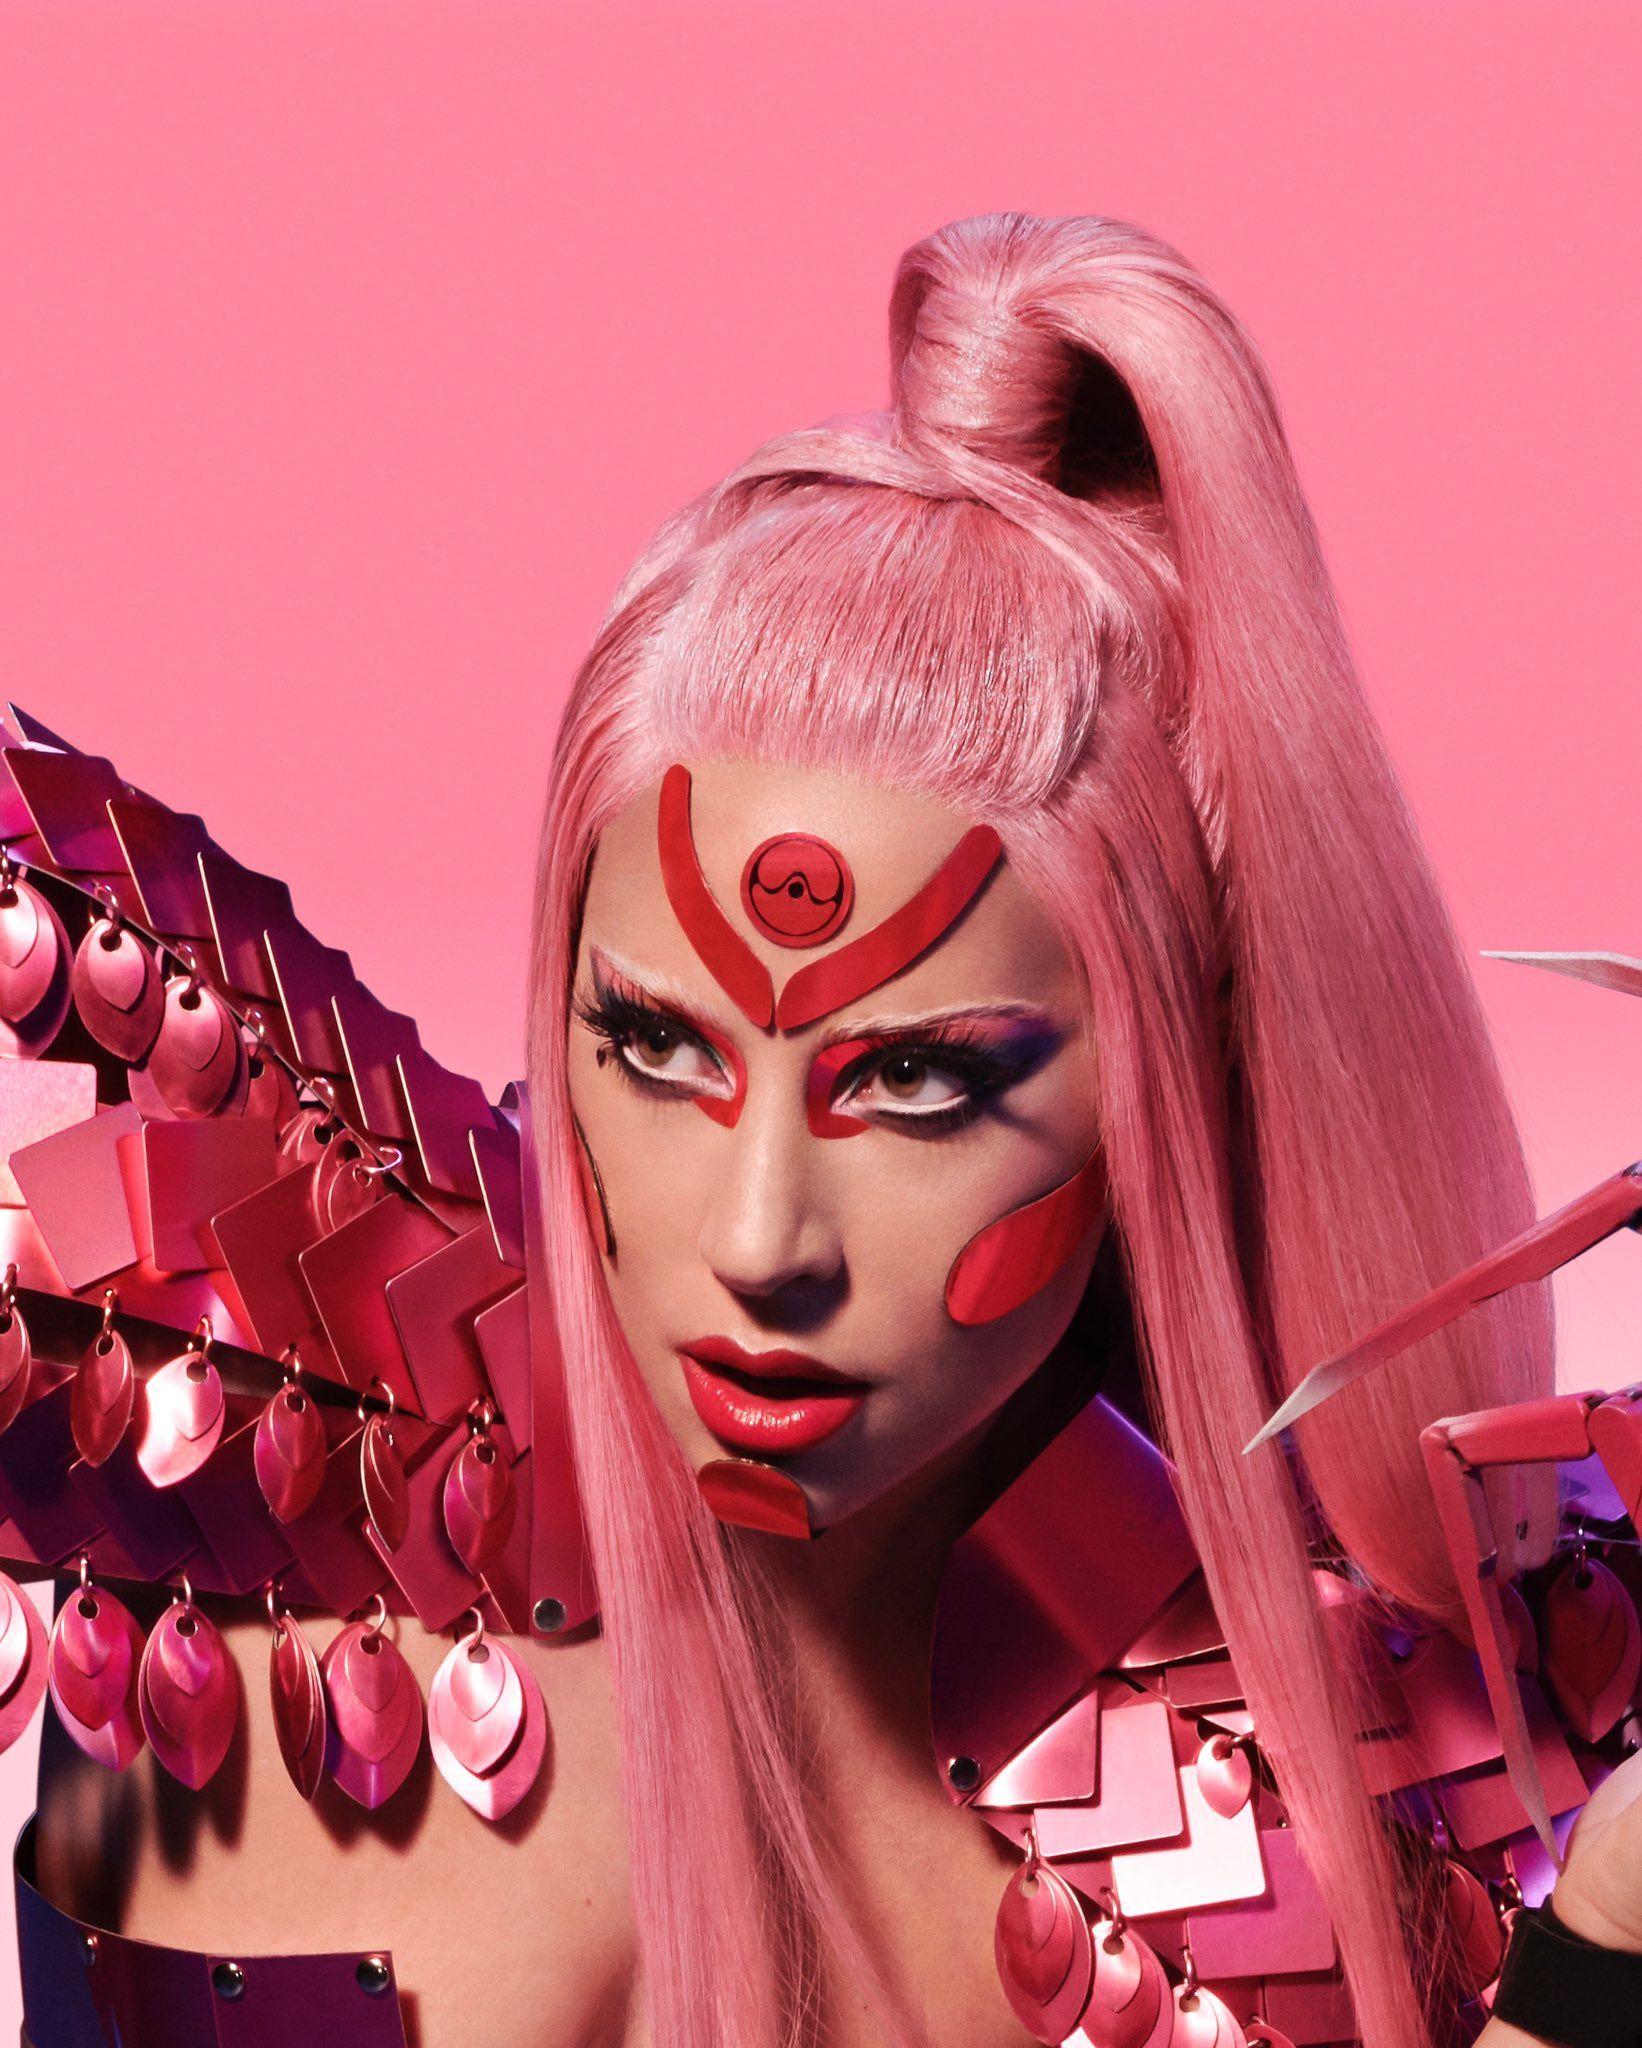 Lady Gaga Stupid Love New Single February 28 2020 Buy And Stream This Is Not A Drill In 2020 Lady Gaga Albums Gaga Lady Gaga